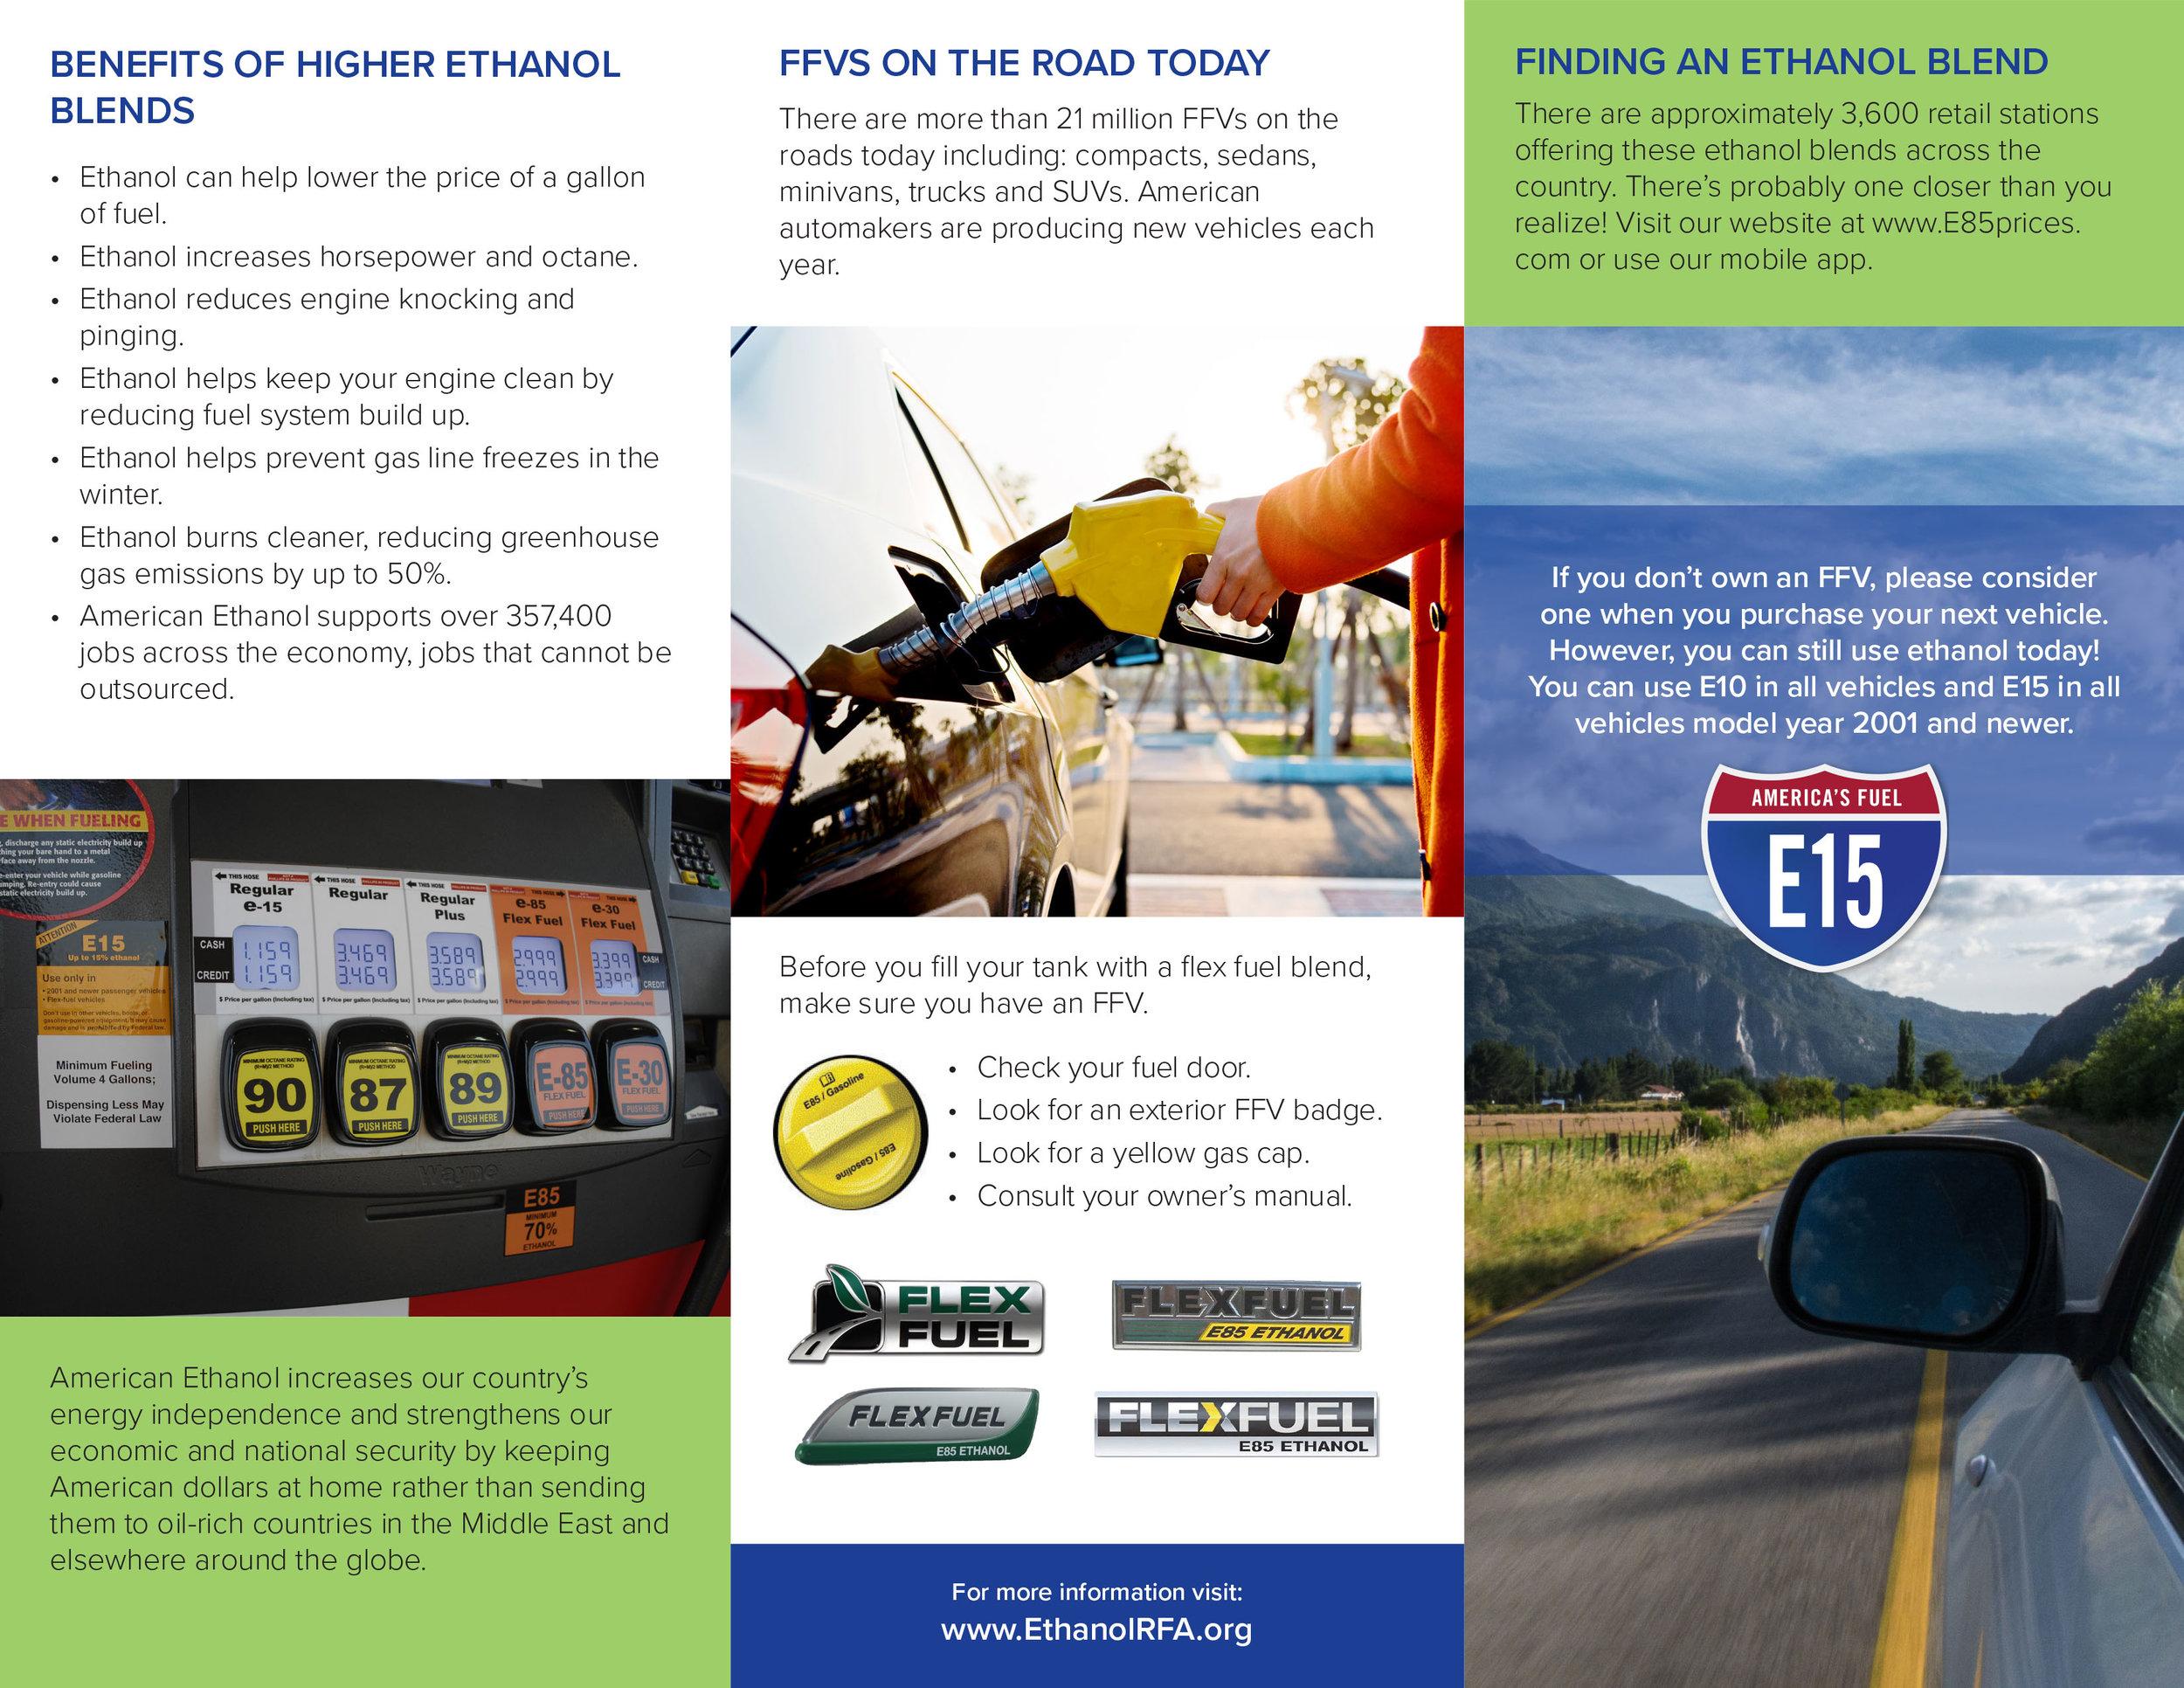 Consumer Brochure Sample.jpg